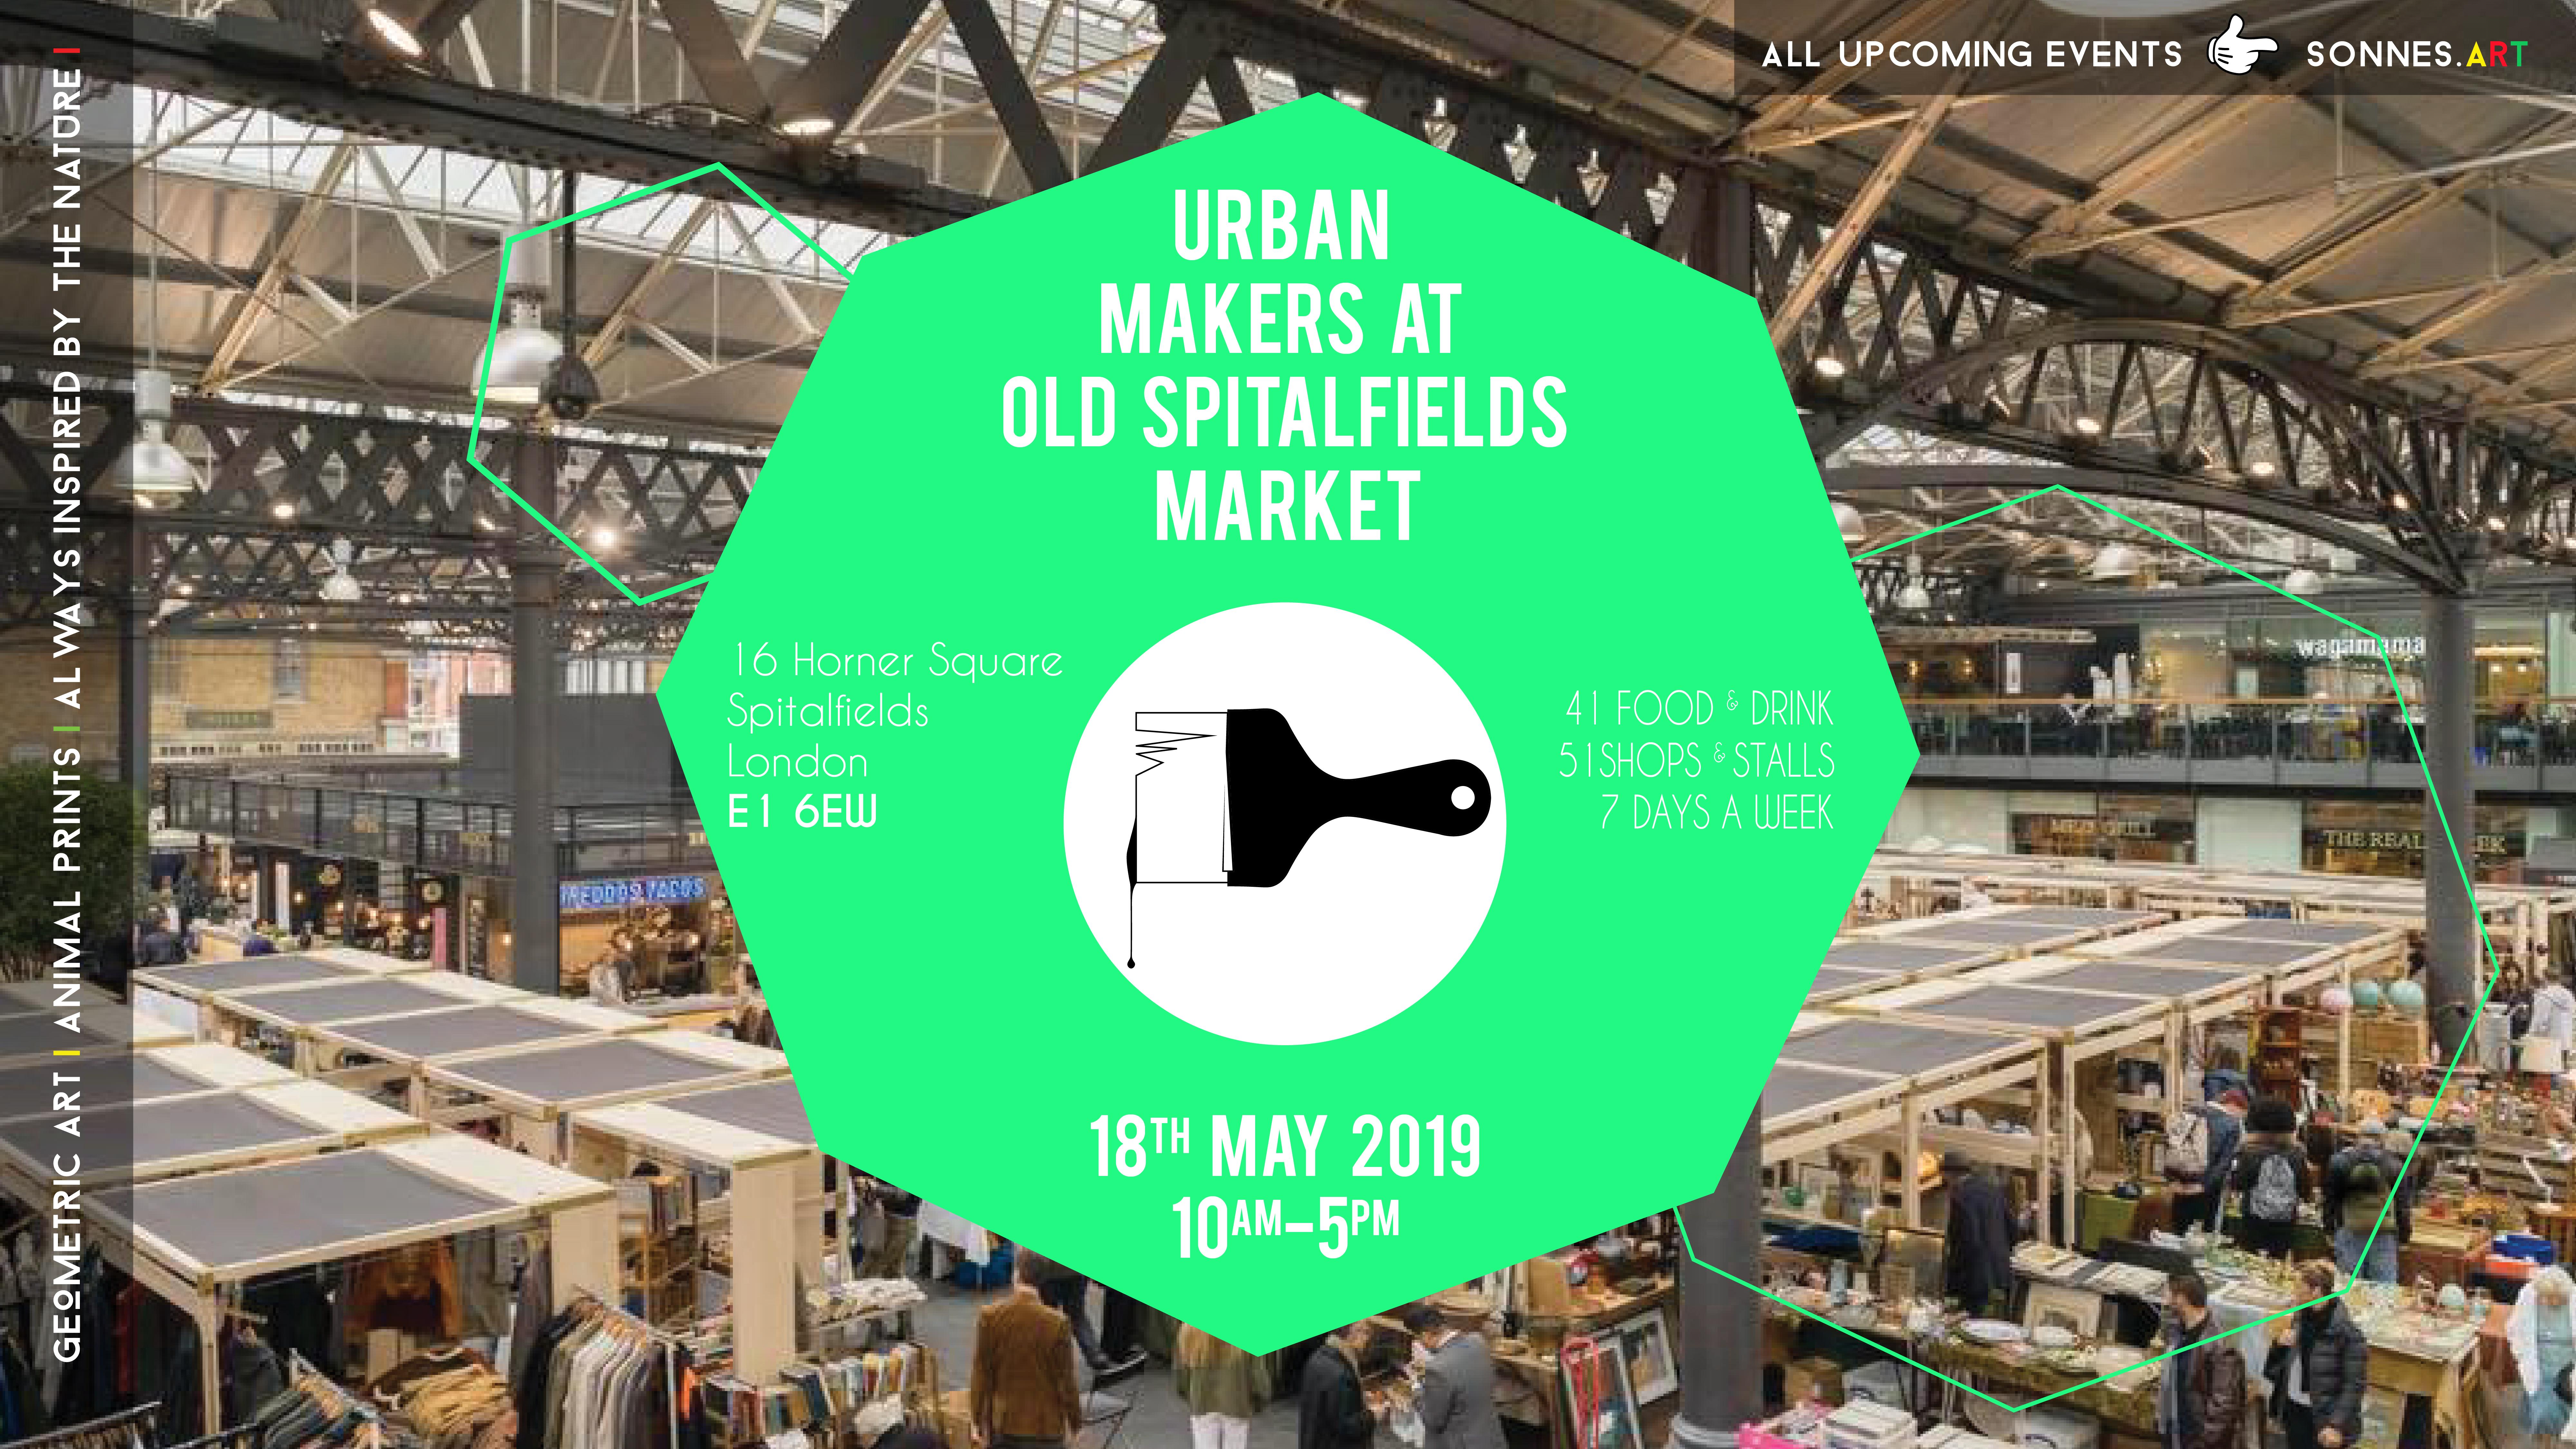 Urban Makers at Old Spitalfields Market // East London Market